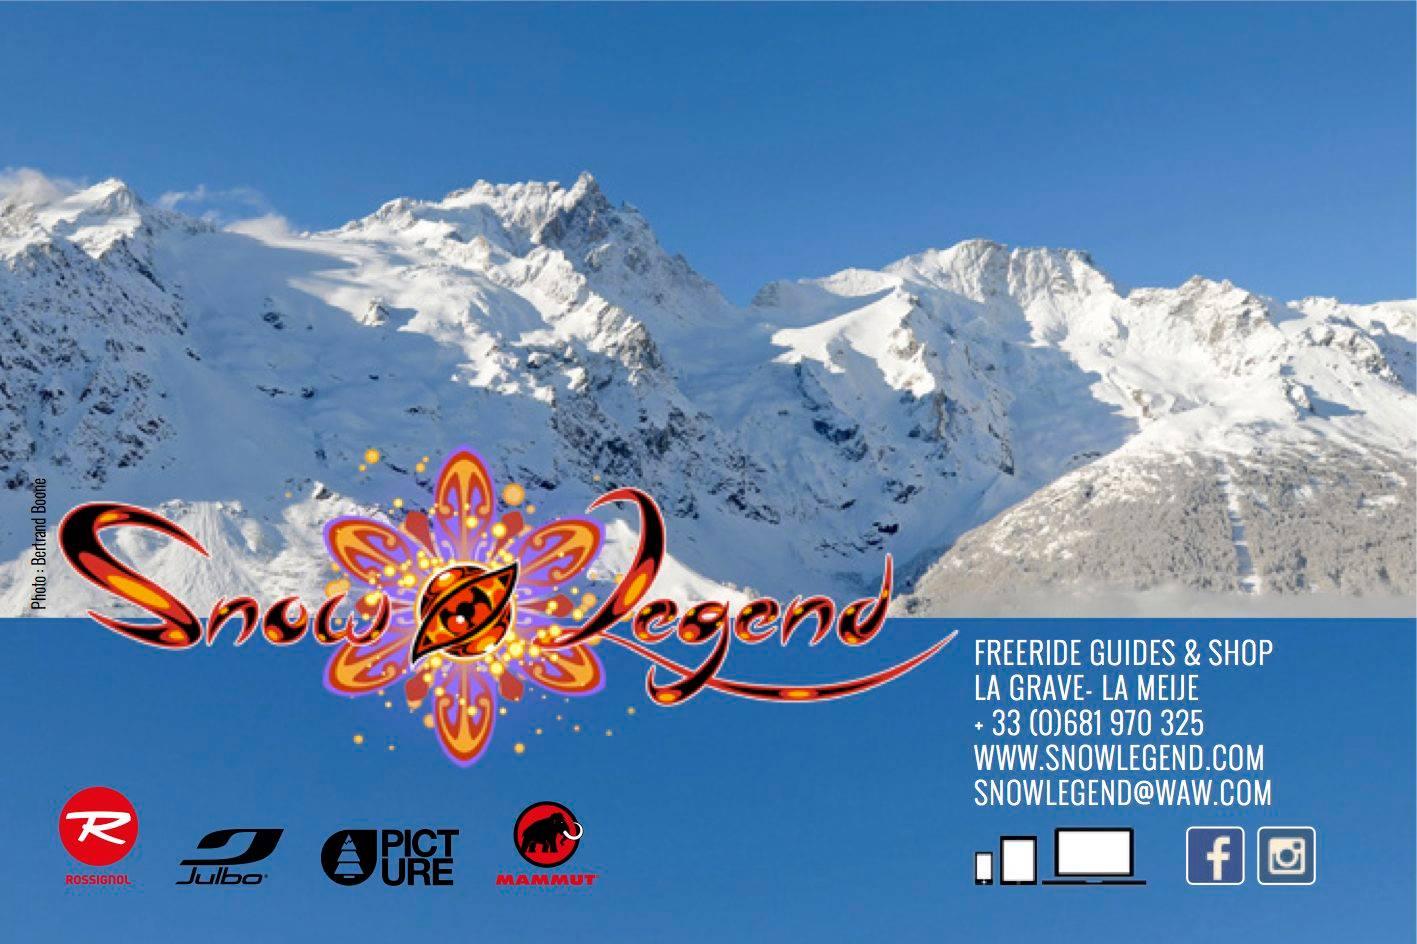 Stages de Ski / Snowboard freeride, Randonnée, Splitboard avec SnowLegend